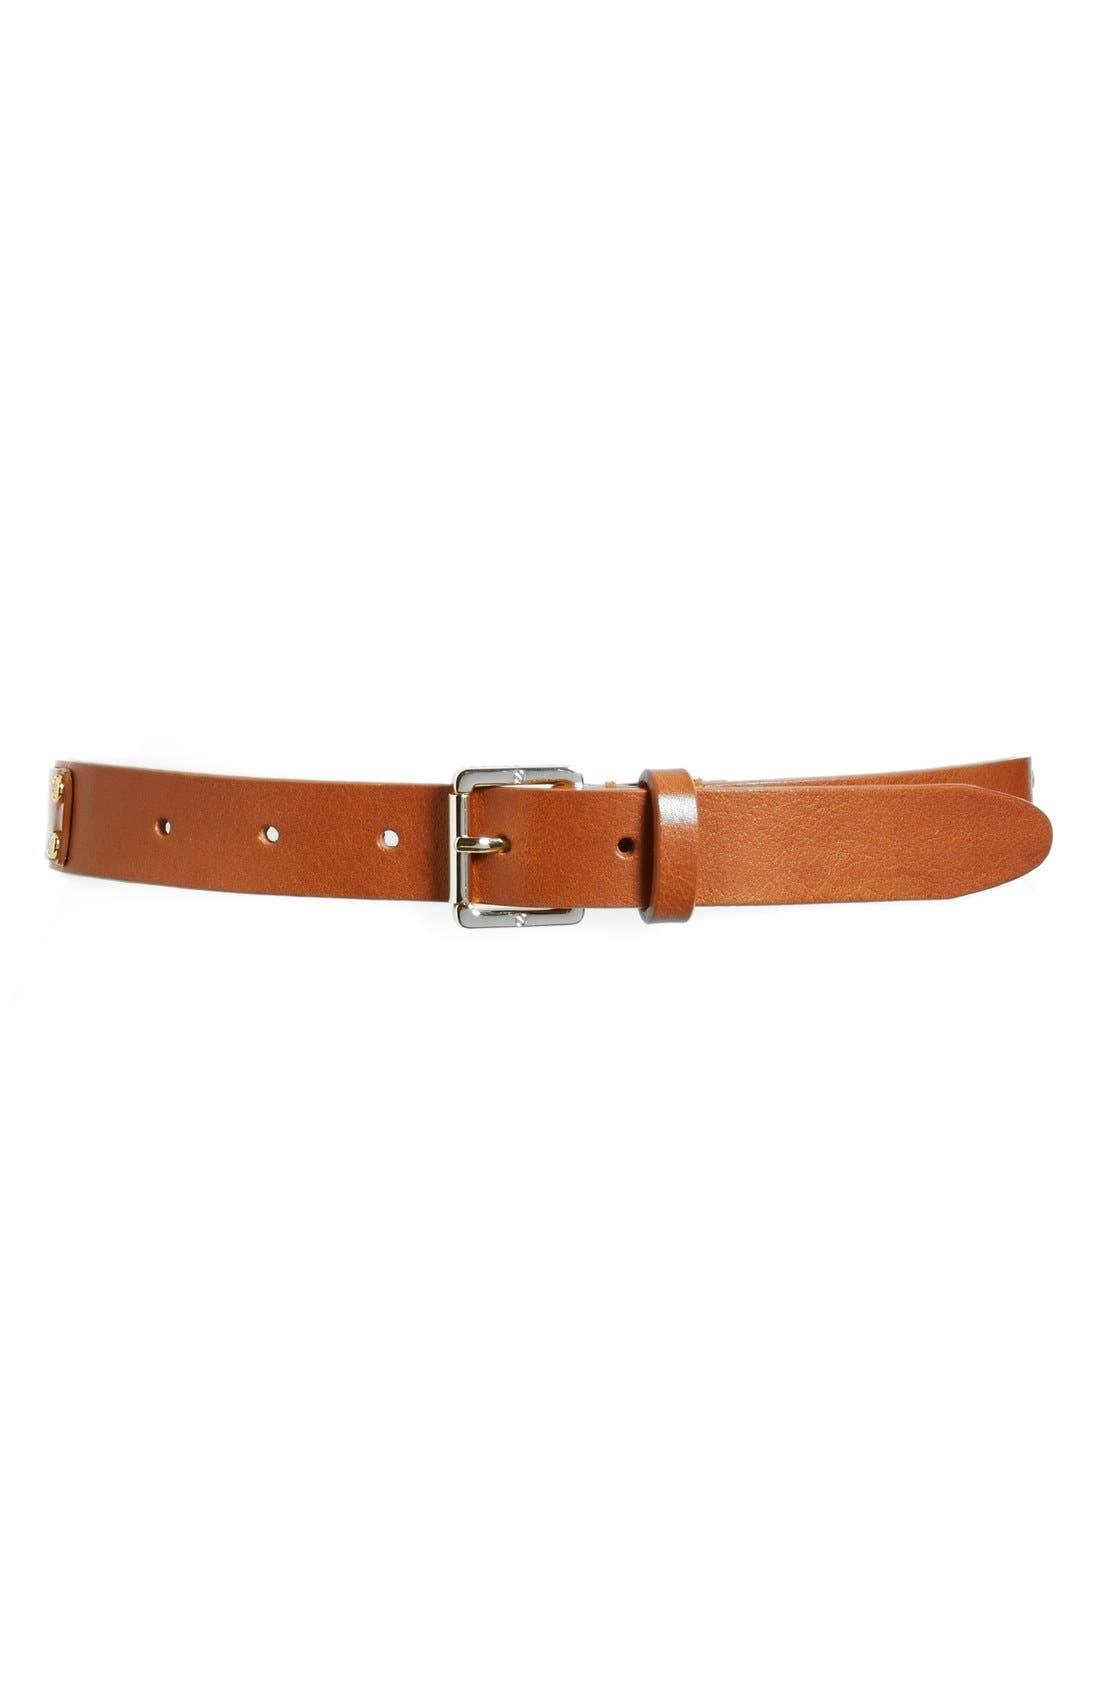 Main Image - Tory Burch Leather Rivet Belt